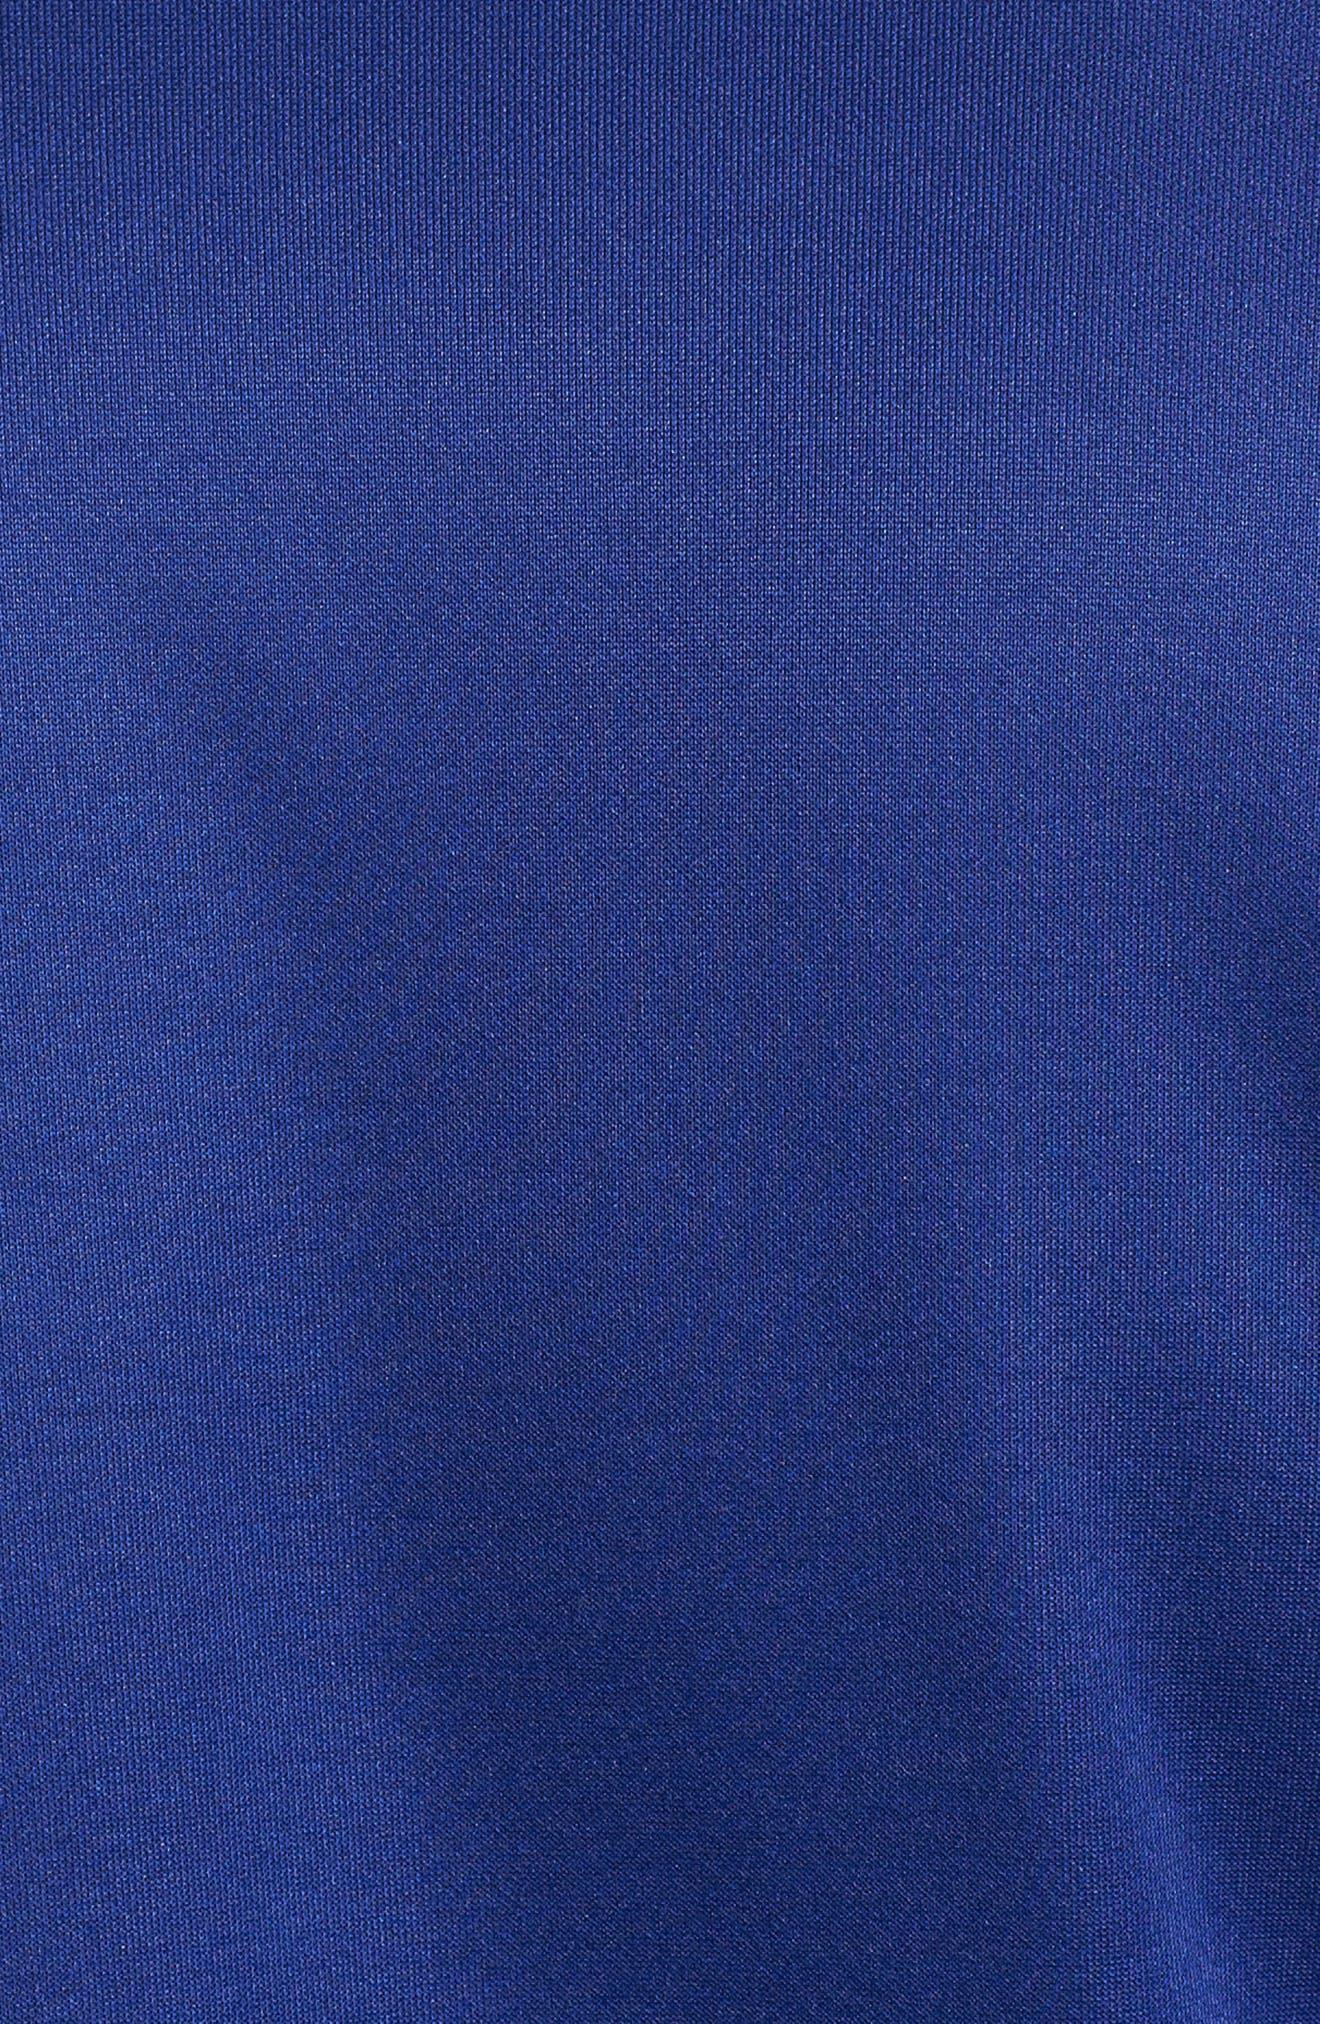 Sportswear Zip Track Jacket,                             Alternate thumbnail 5, color,                             DEEP ROYAL BLUE/ WHITE/ BLACK